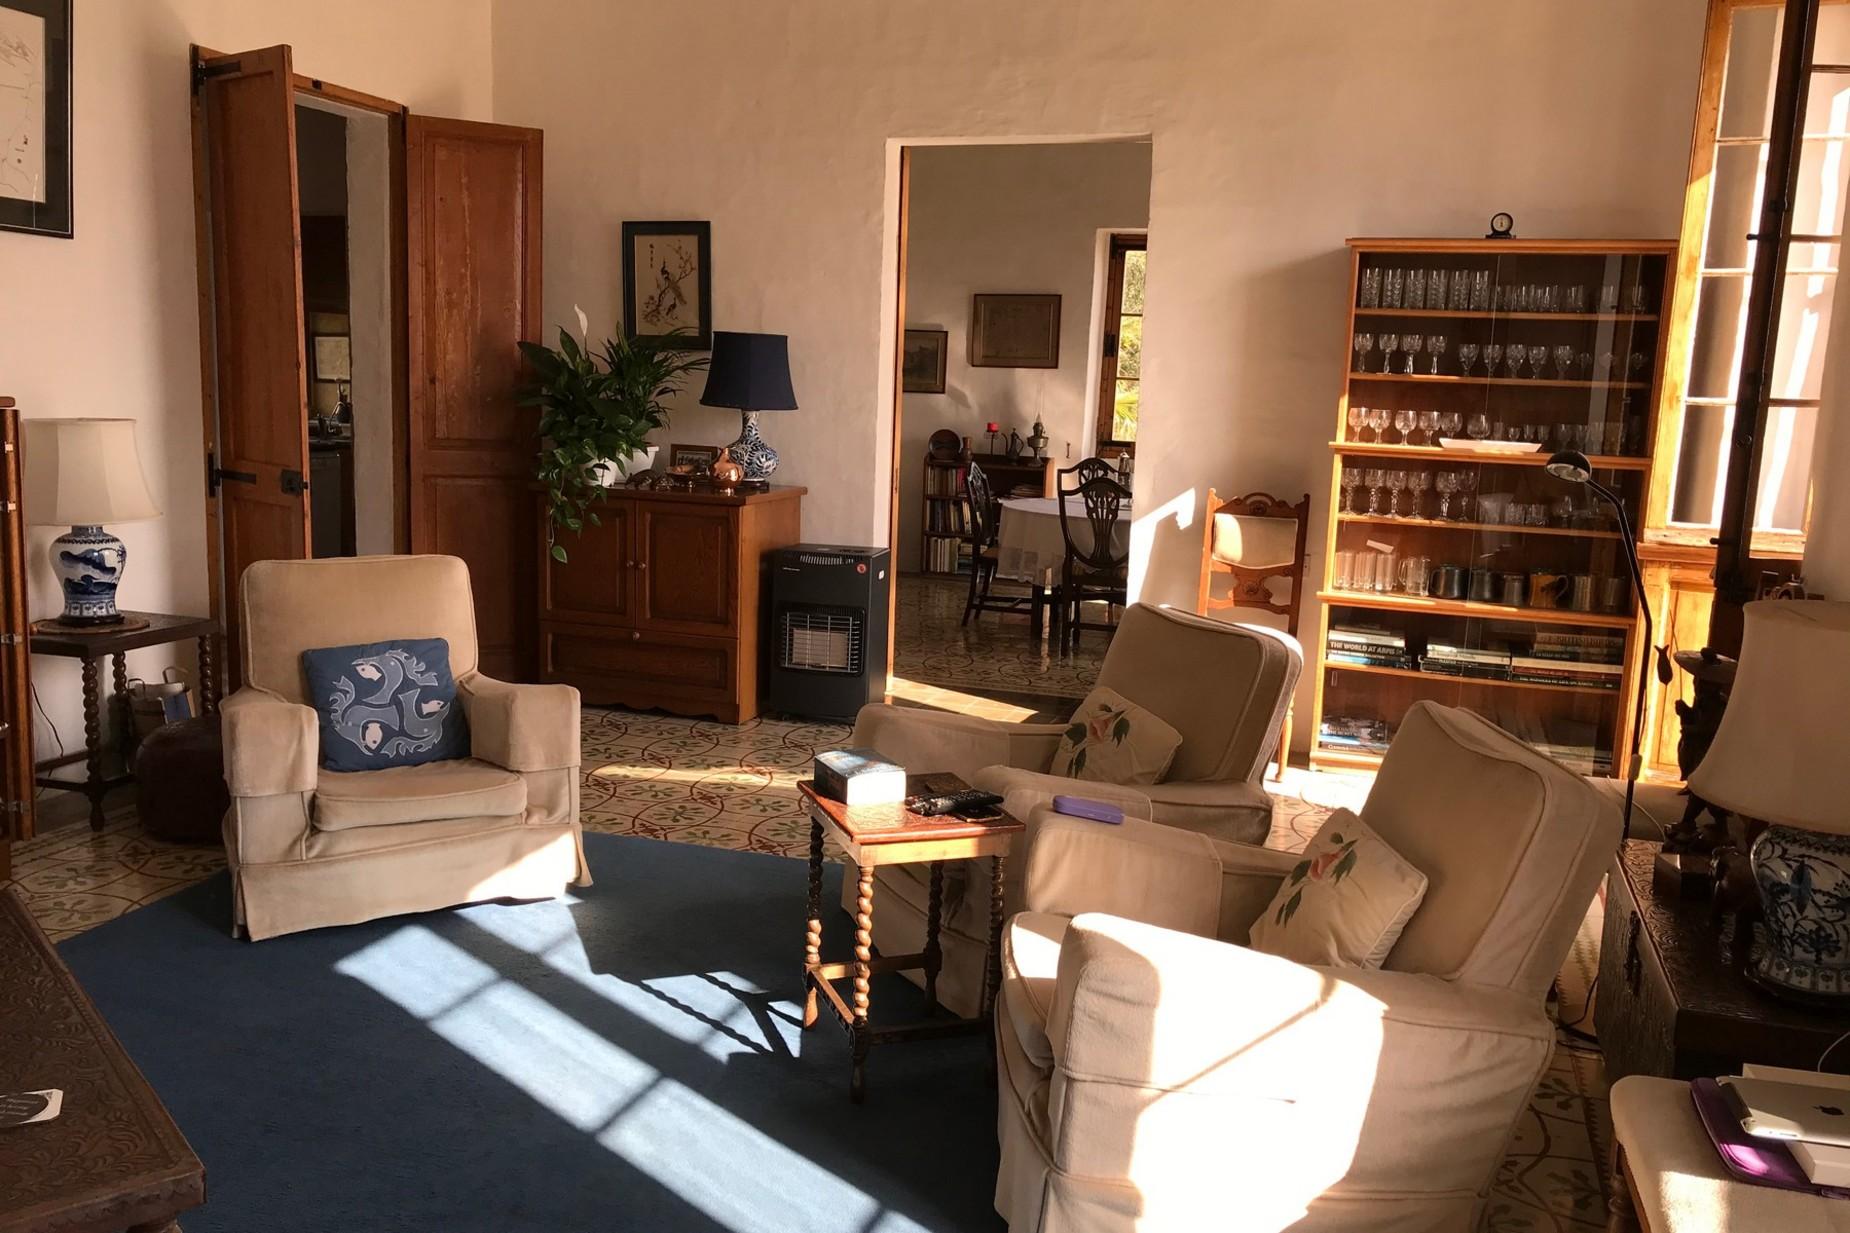 6 bed Town House For Sale in Birzebbugia, Birzebbugia - thumb 10